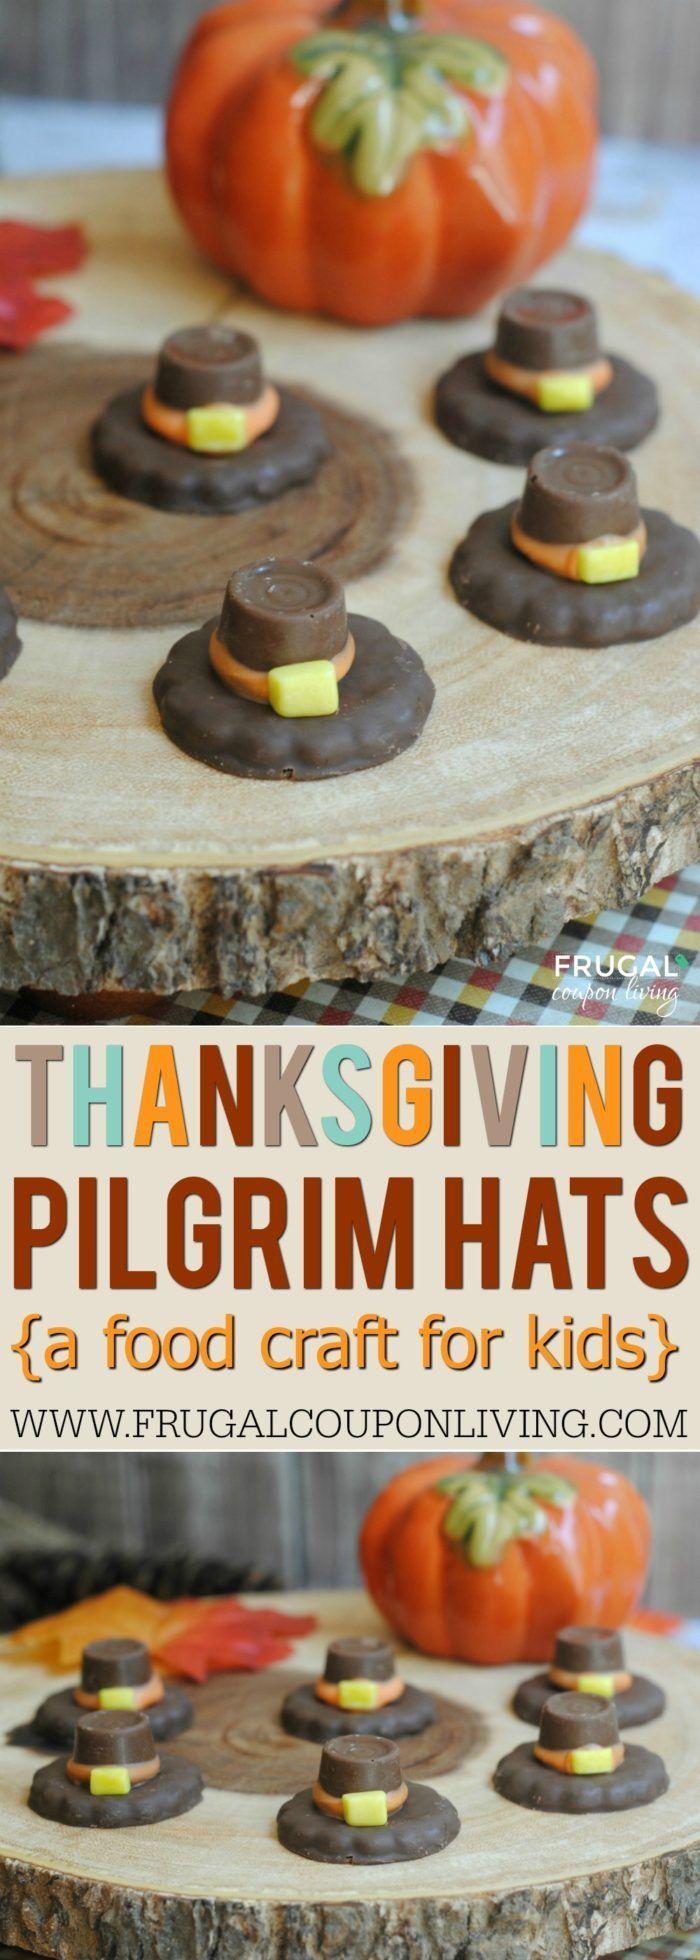 Thanksgiving Pilgrim Hats Cookies for Kids. Kids Food Craft on Frugal Coupon Liv...